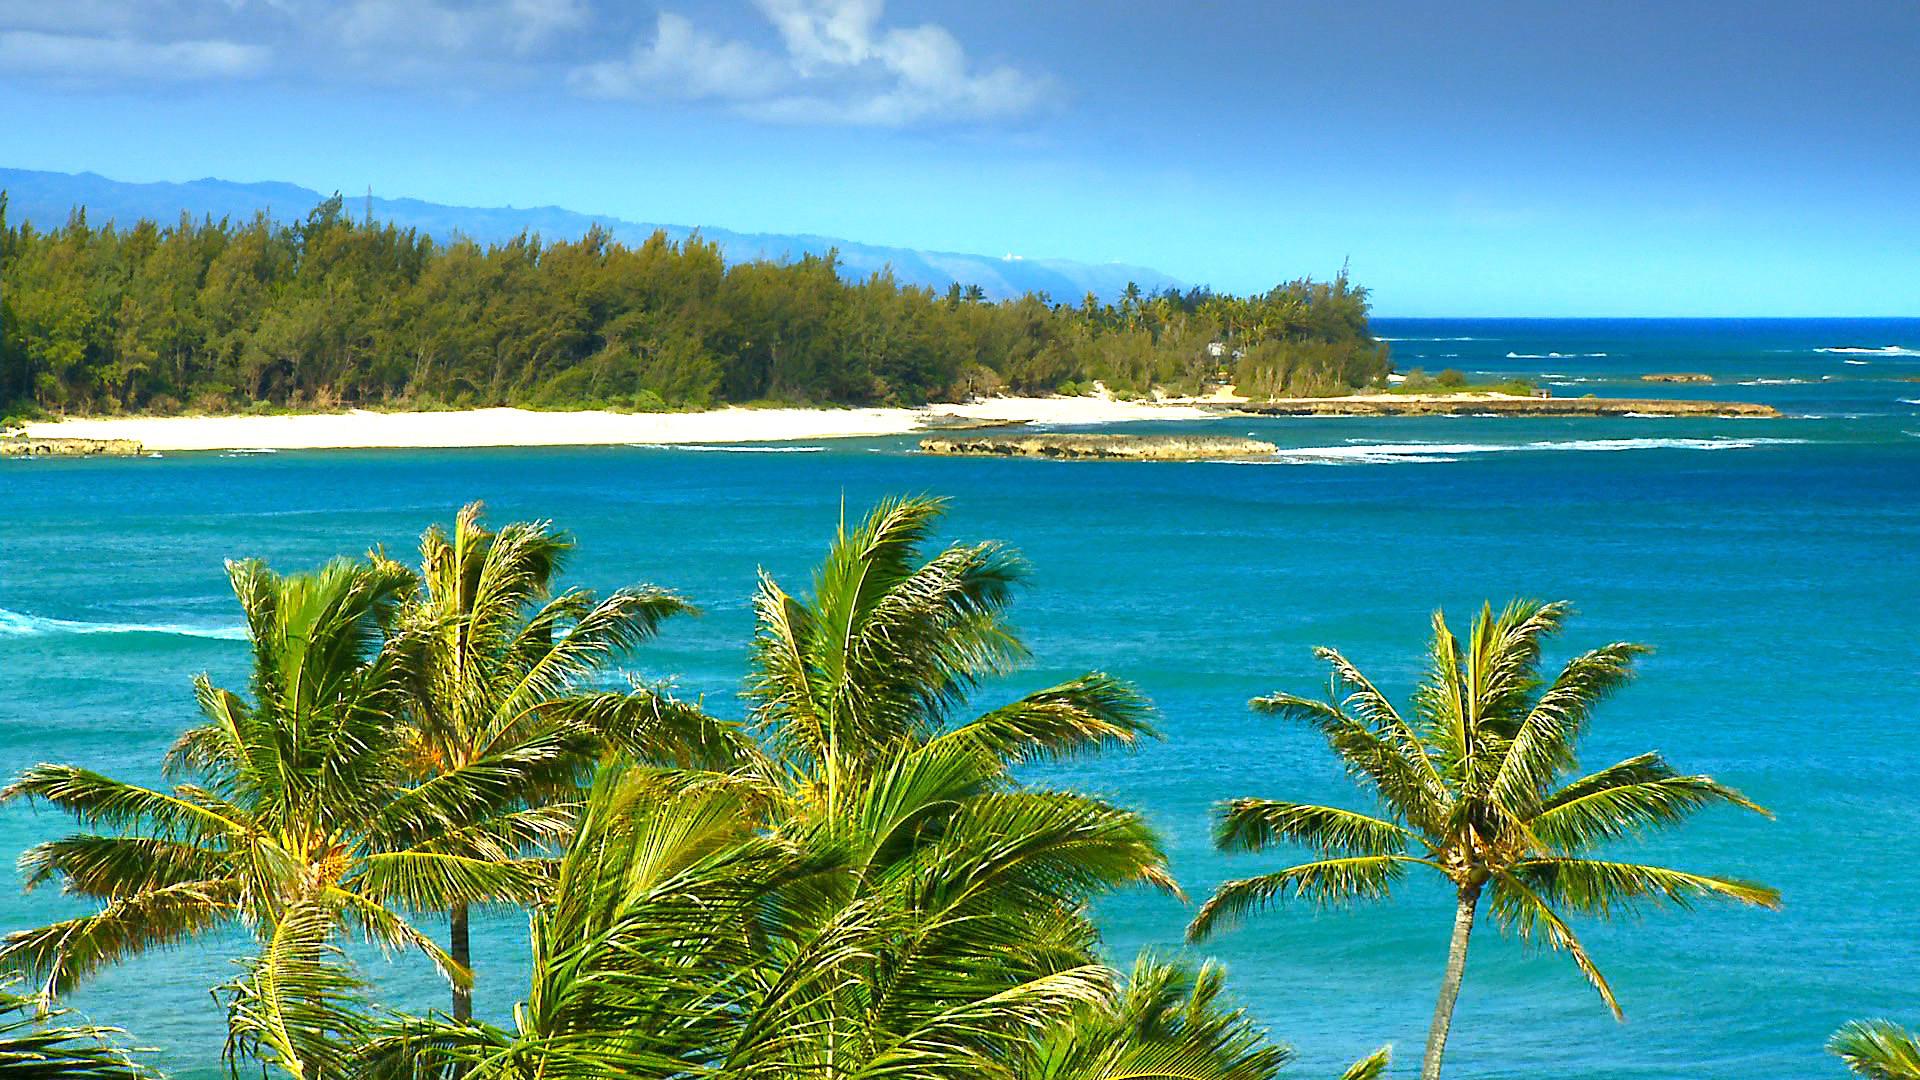 Hawaii Beaches wallpaper – 11142